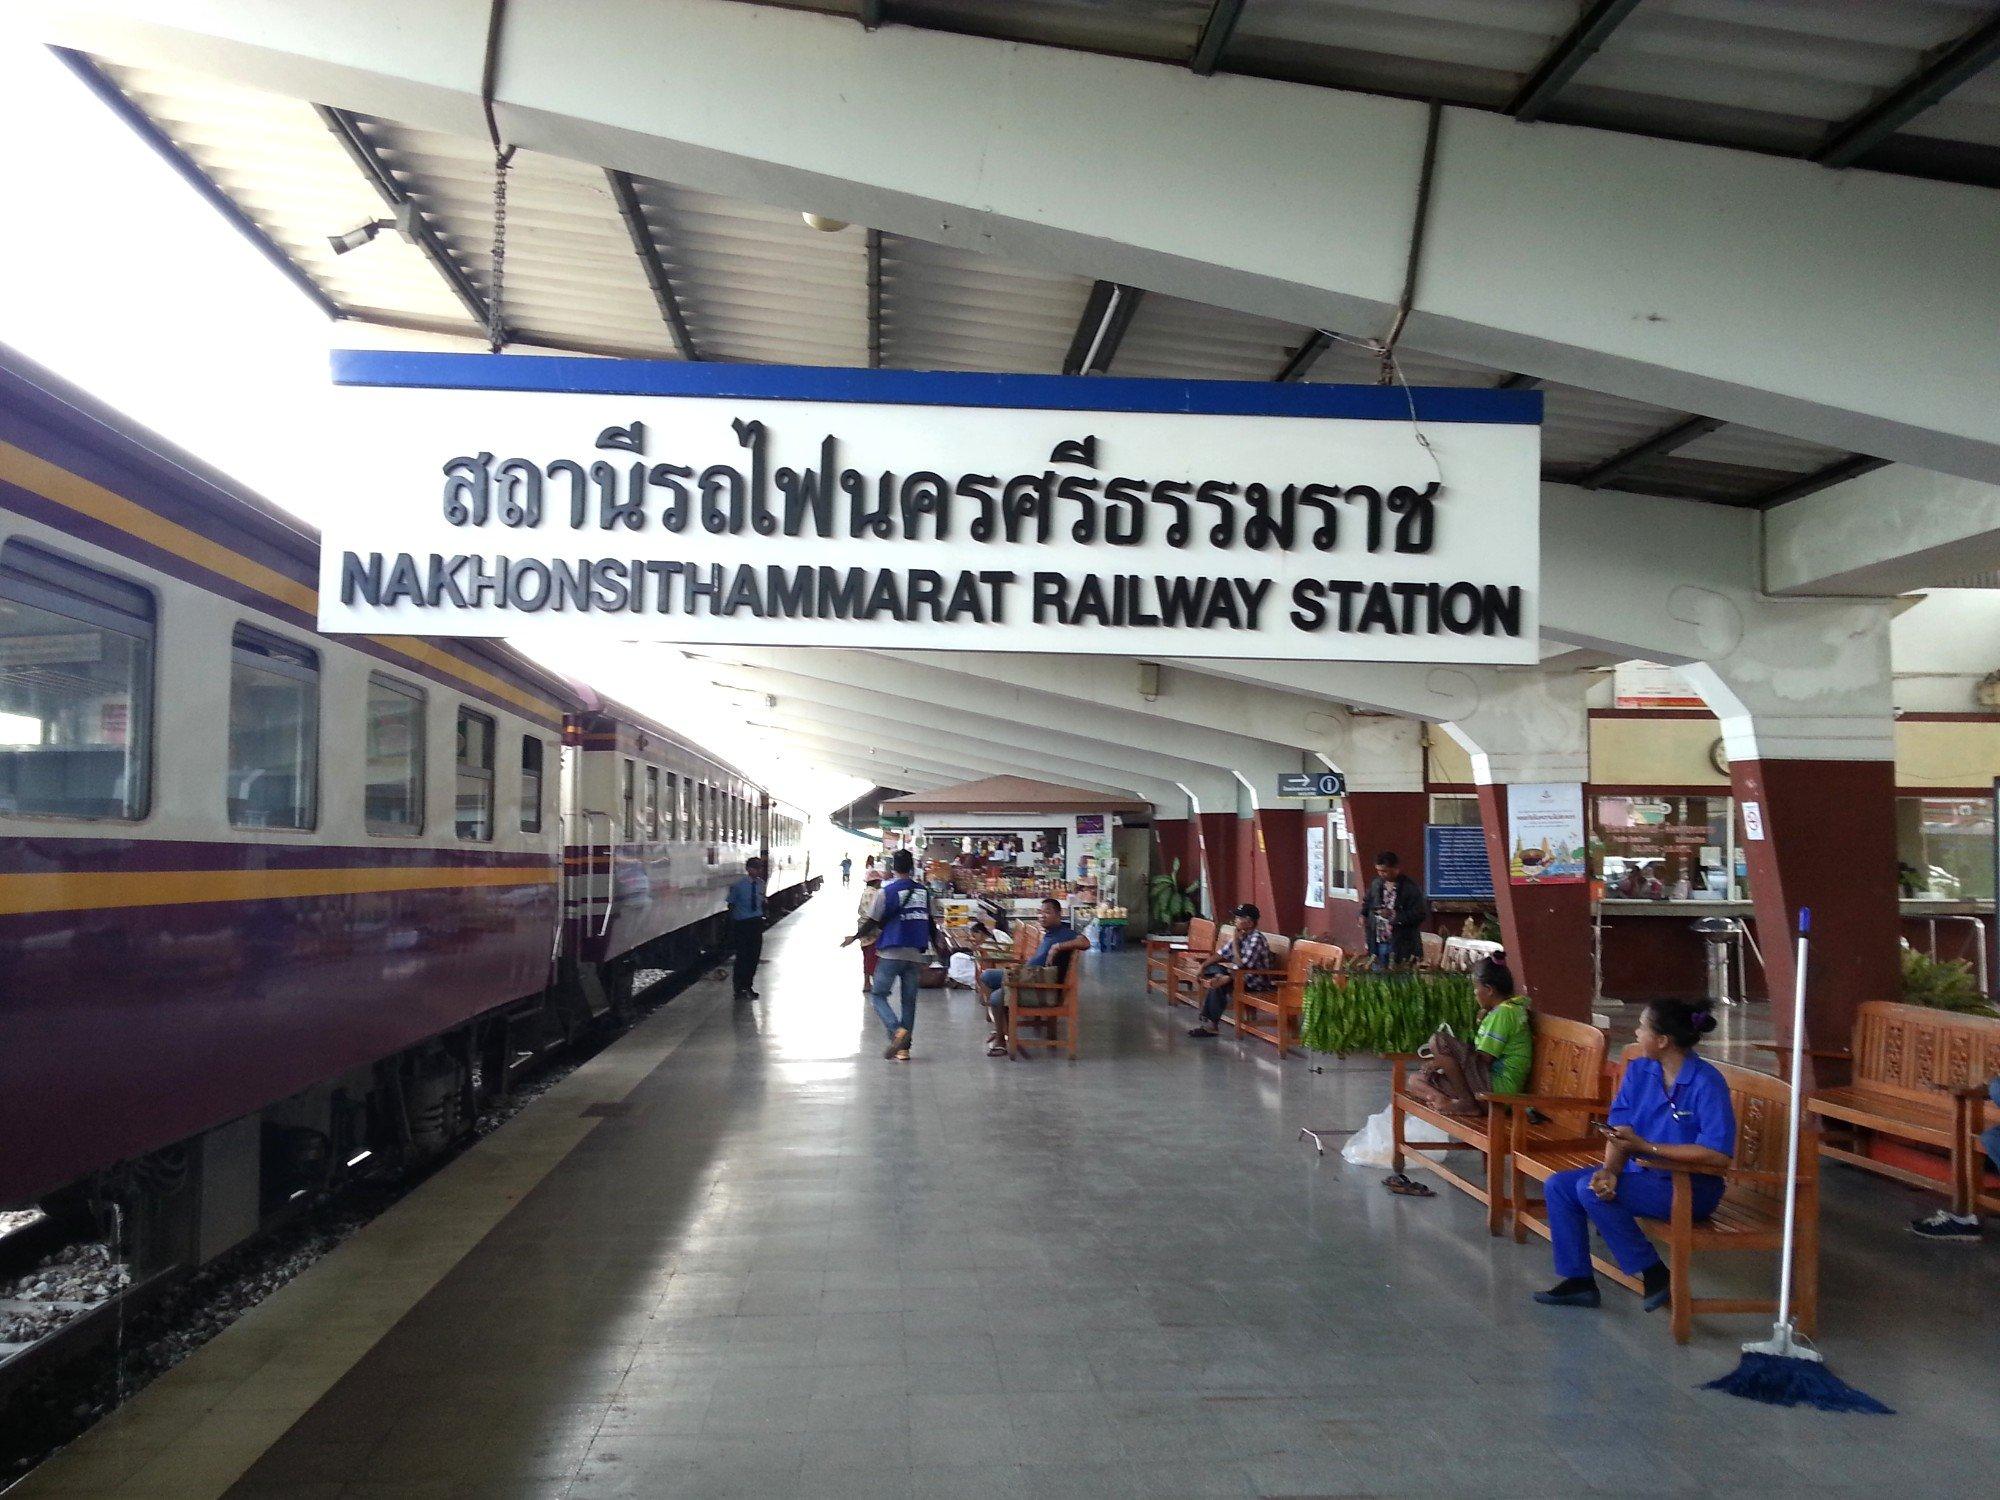 Platform 1 at Nakhon Si Thammarat Railway Station